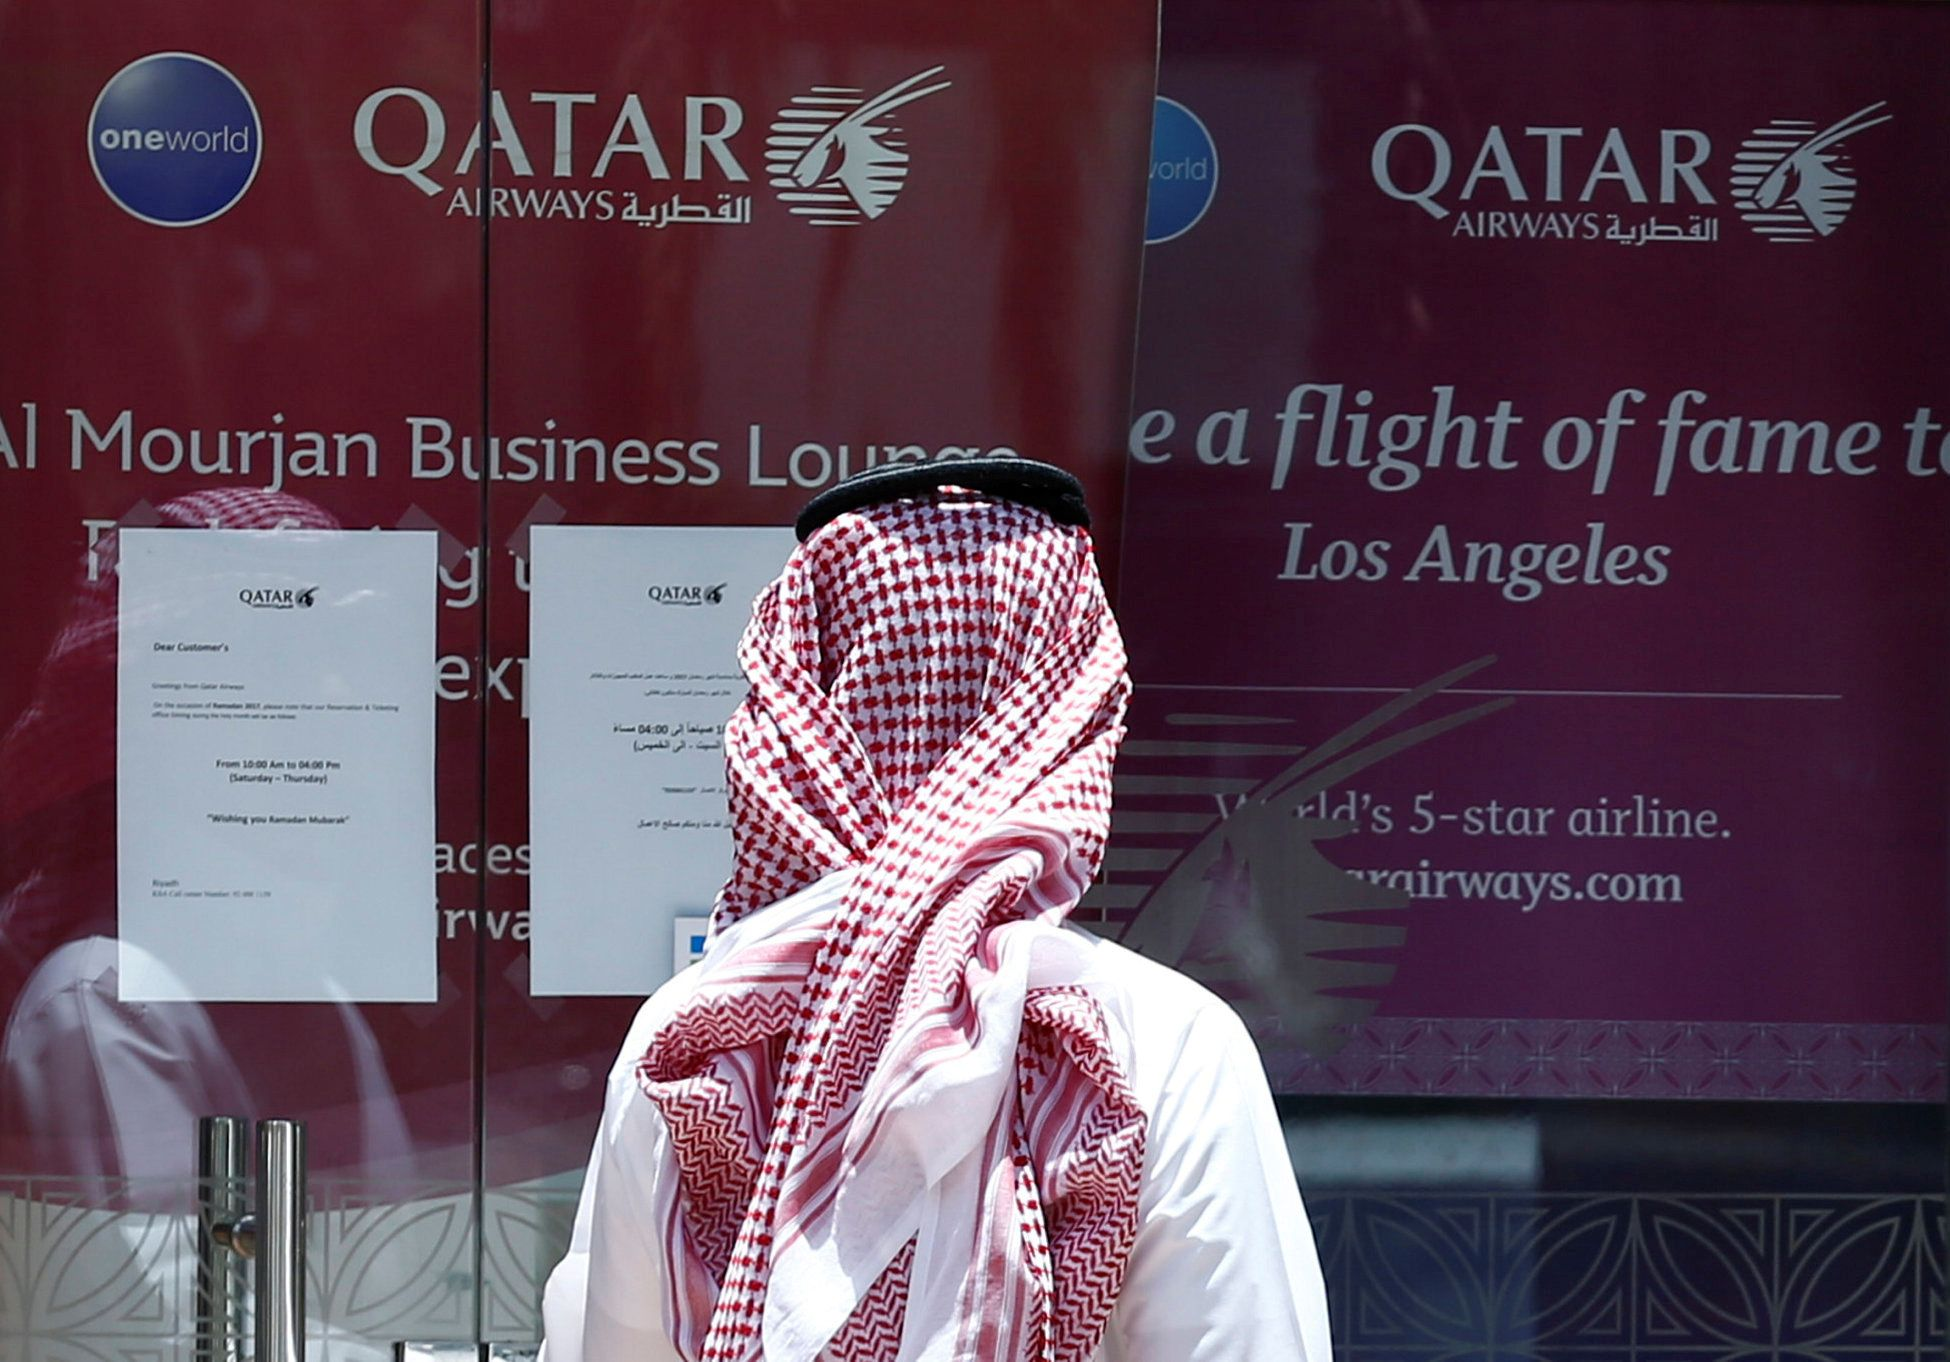 Hard Numbers: Qatar Airways sues, Twitter shuts down QAnon, Rohingyas spared the cane, global development aid falls